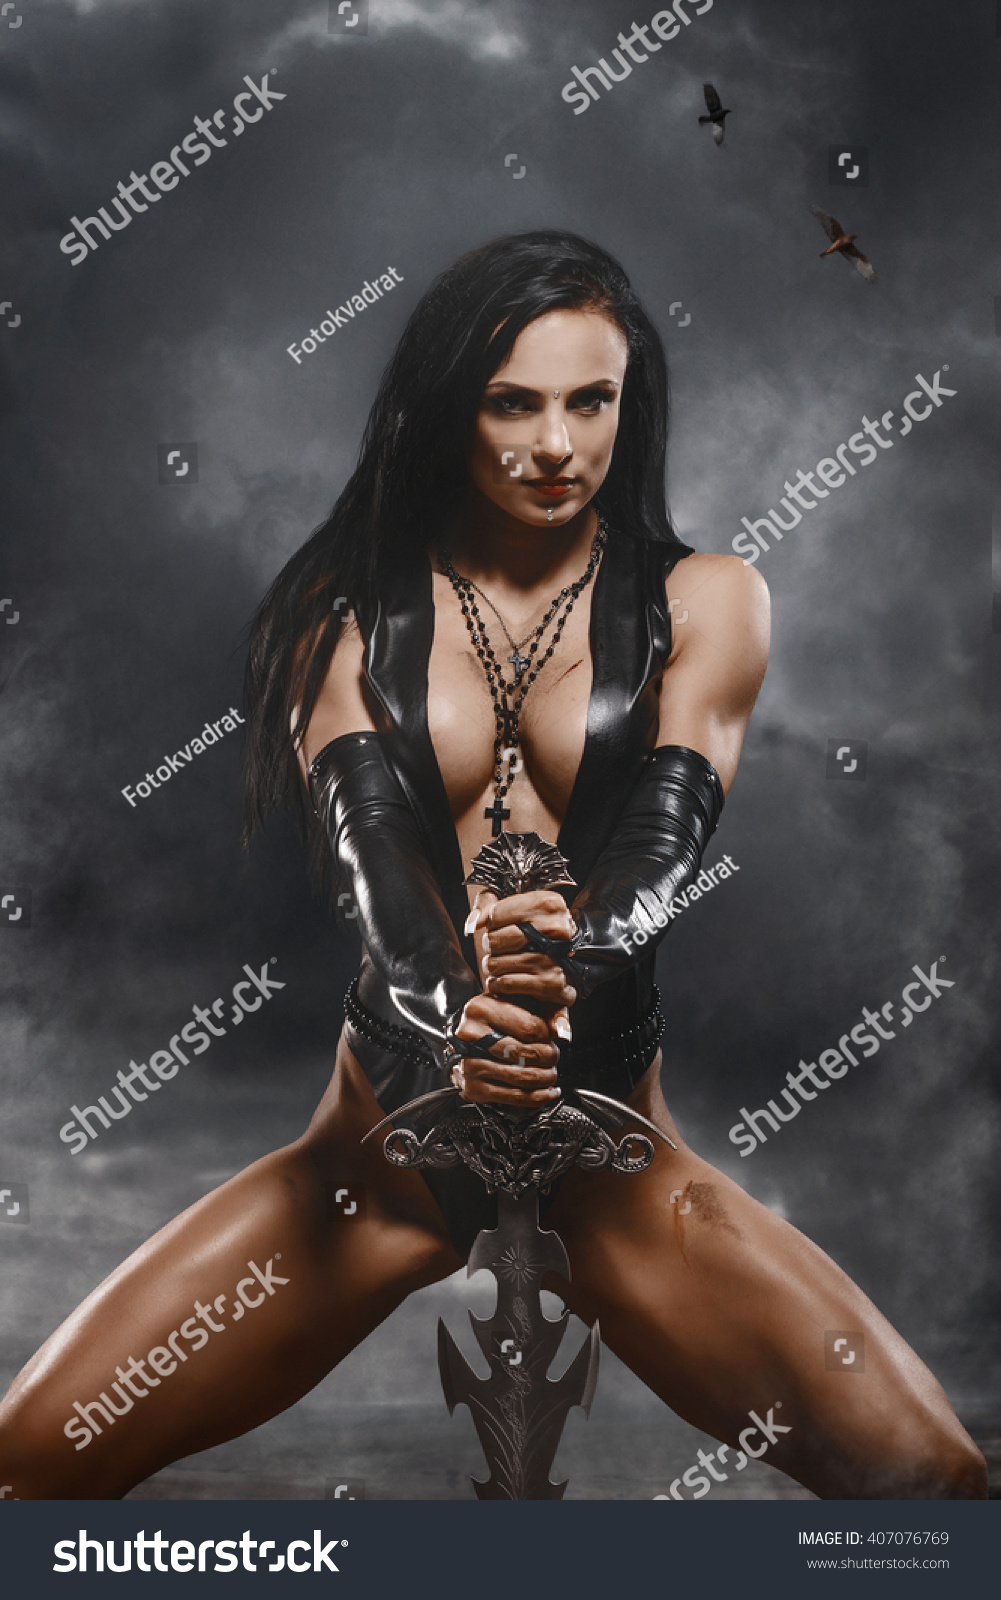 Erotic warriors shows